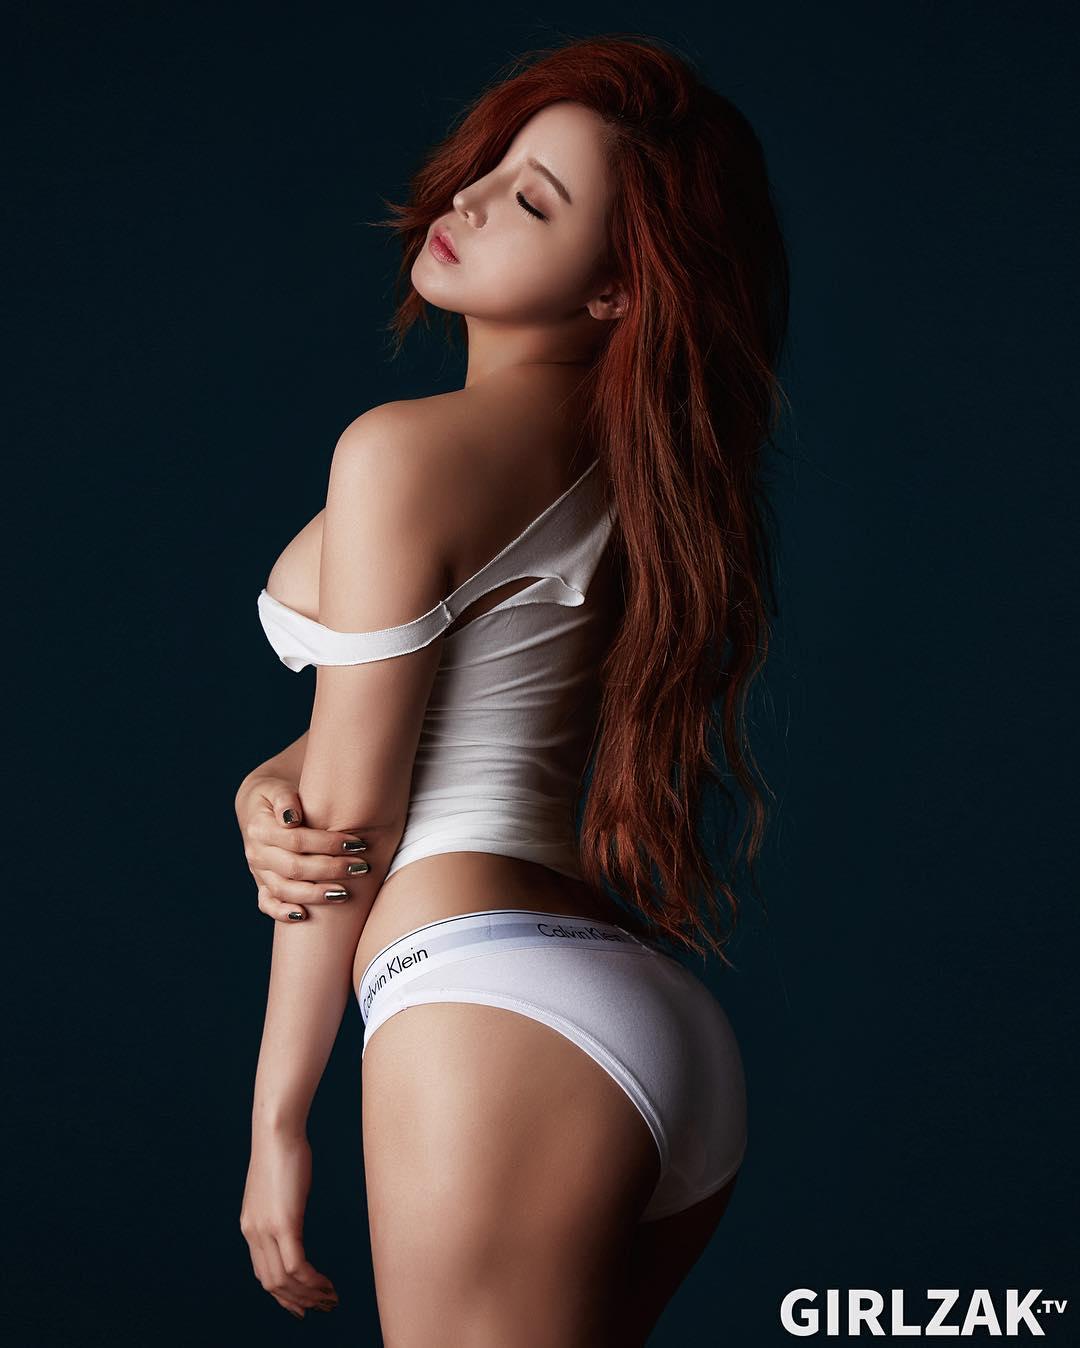 Laysha Goeun's latest seductive photo shoot is NSFW — Koreaboo